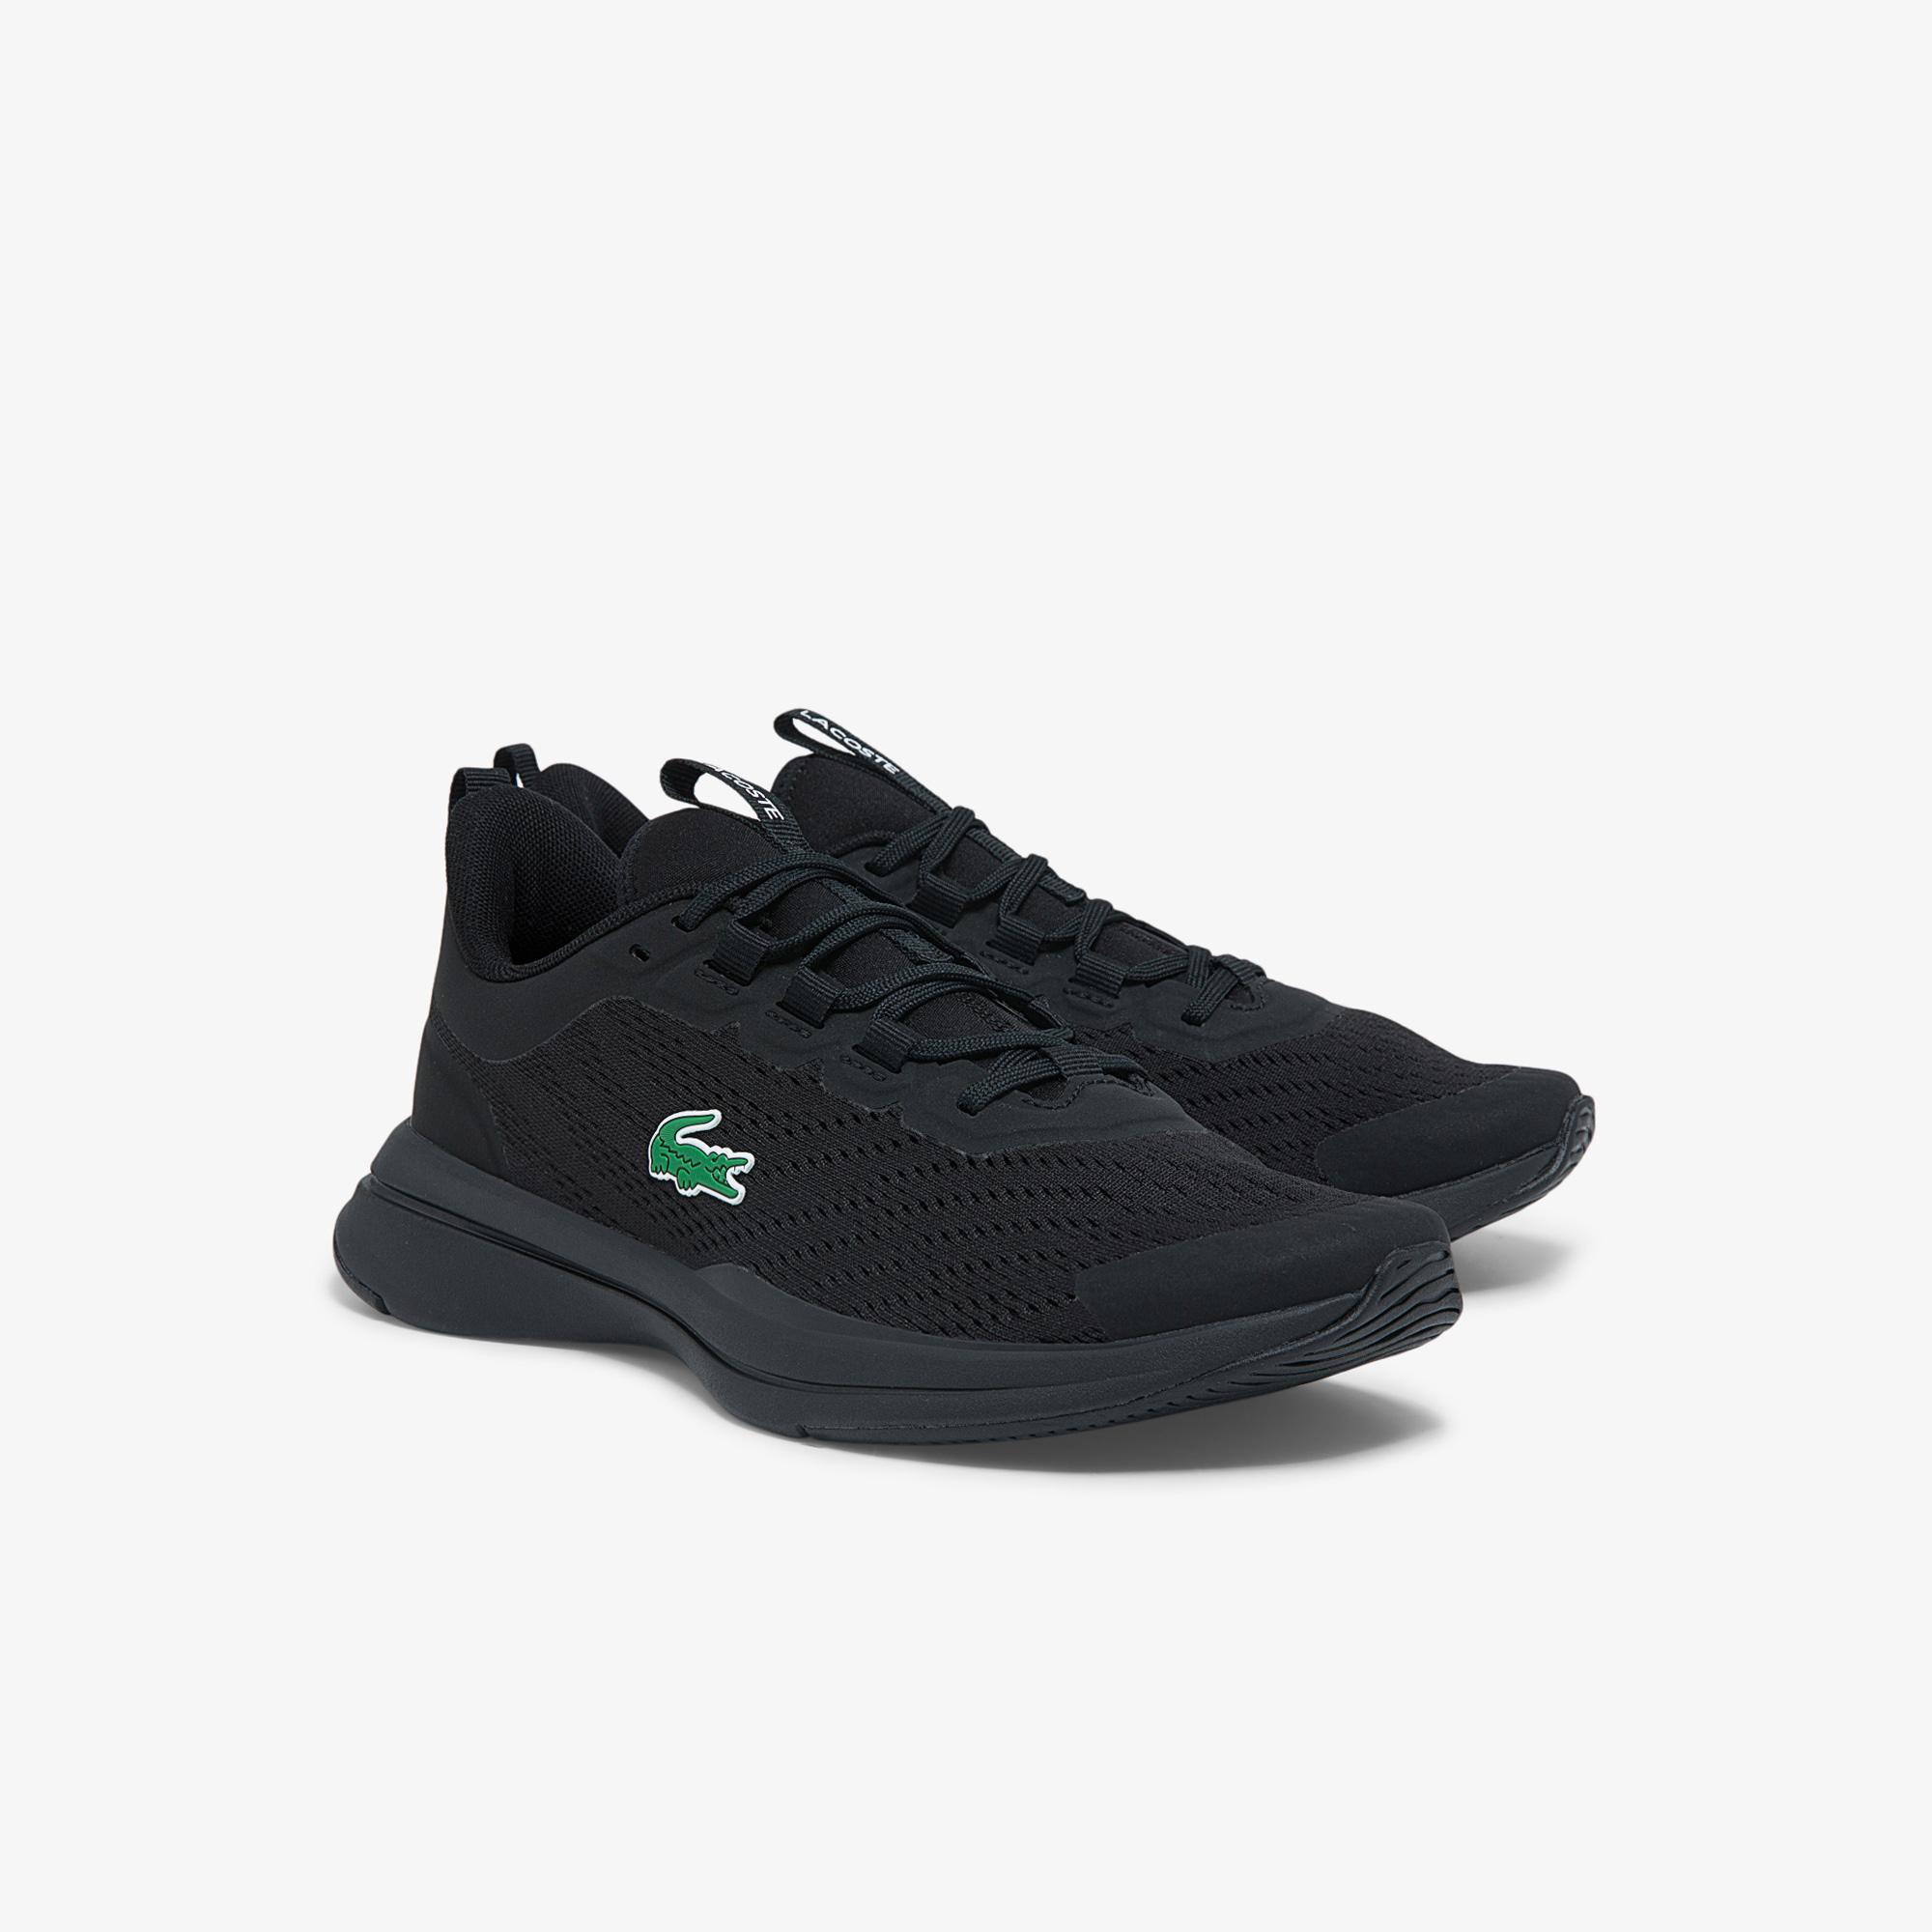 Lacoste Run Spin 0121 1 Sfa Kadın Siyah Sneaker